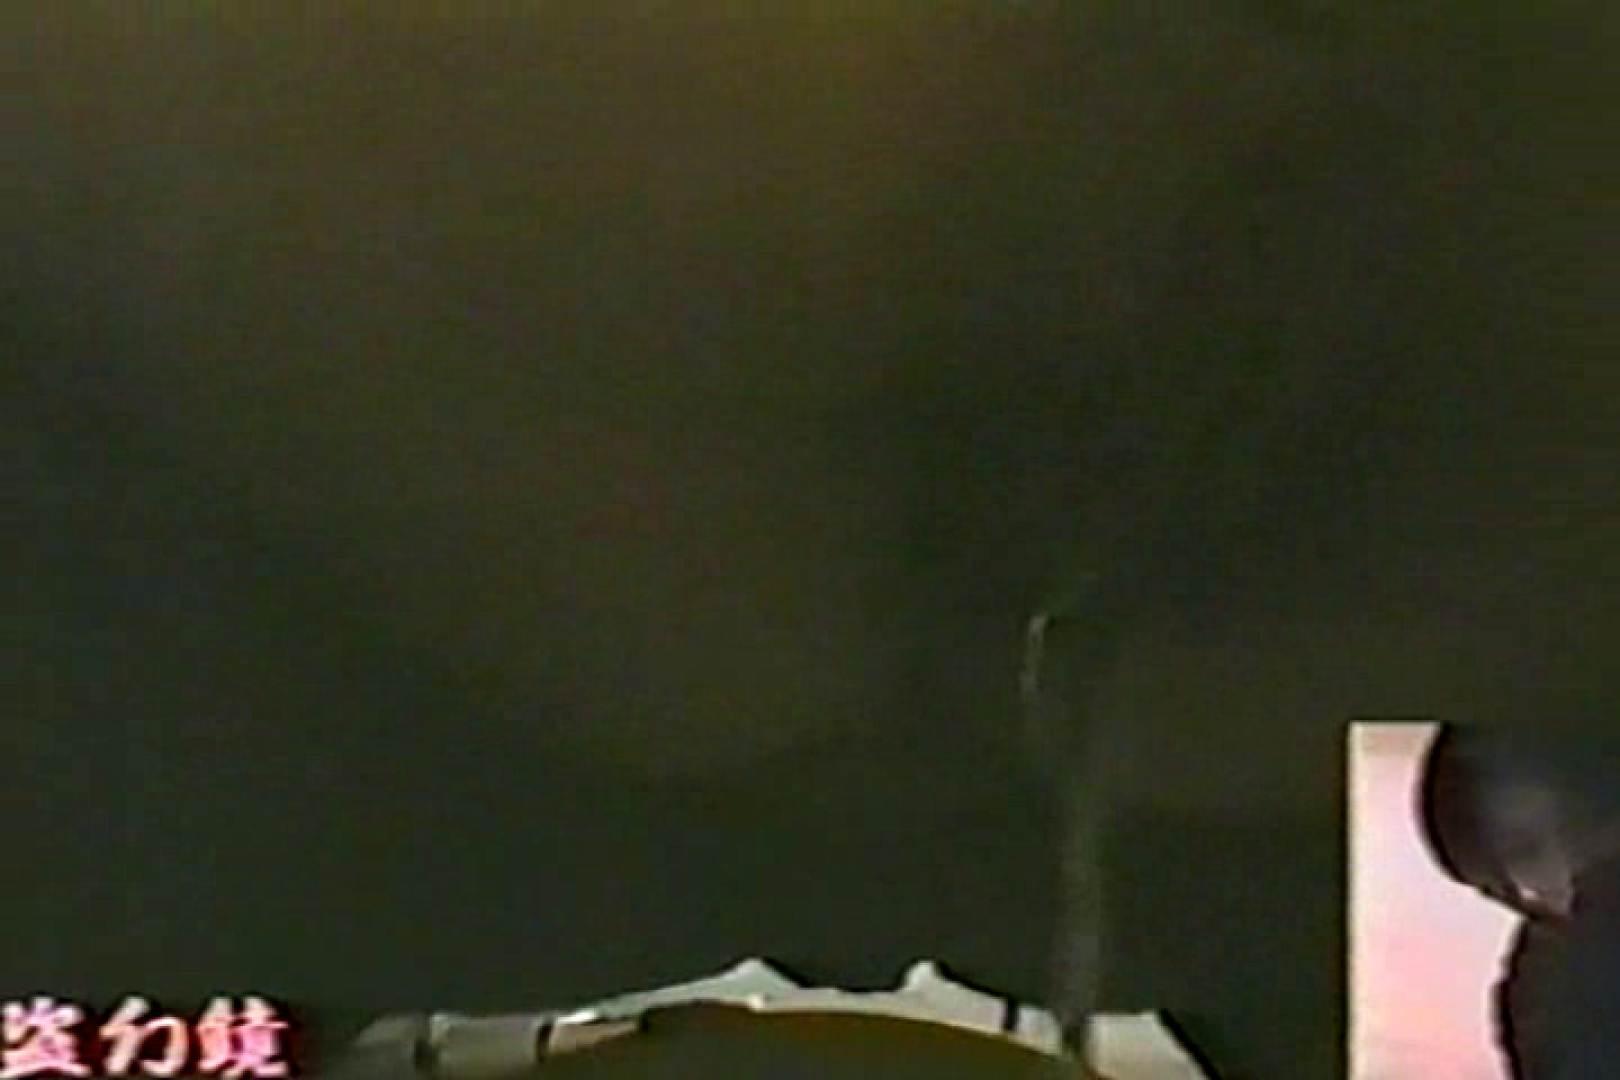 新説羞恥美女んMVX-1 美女ヌード天国  50PIX 33